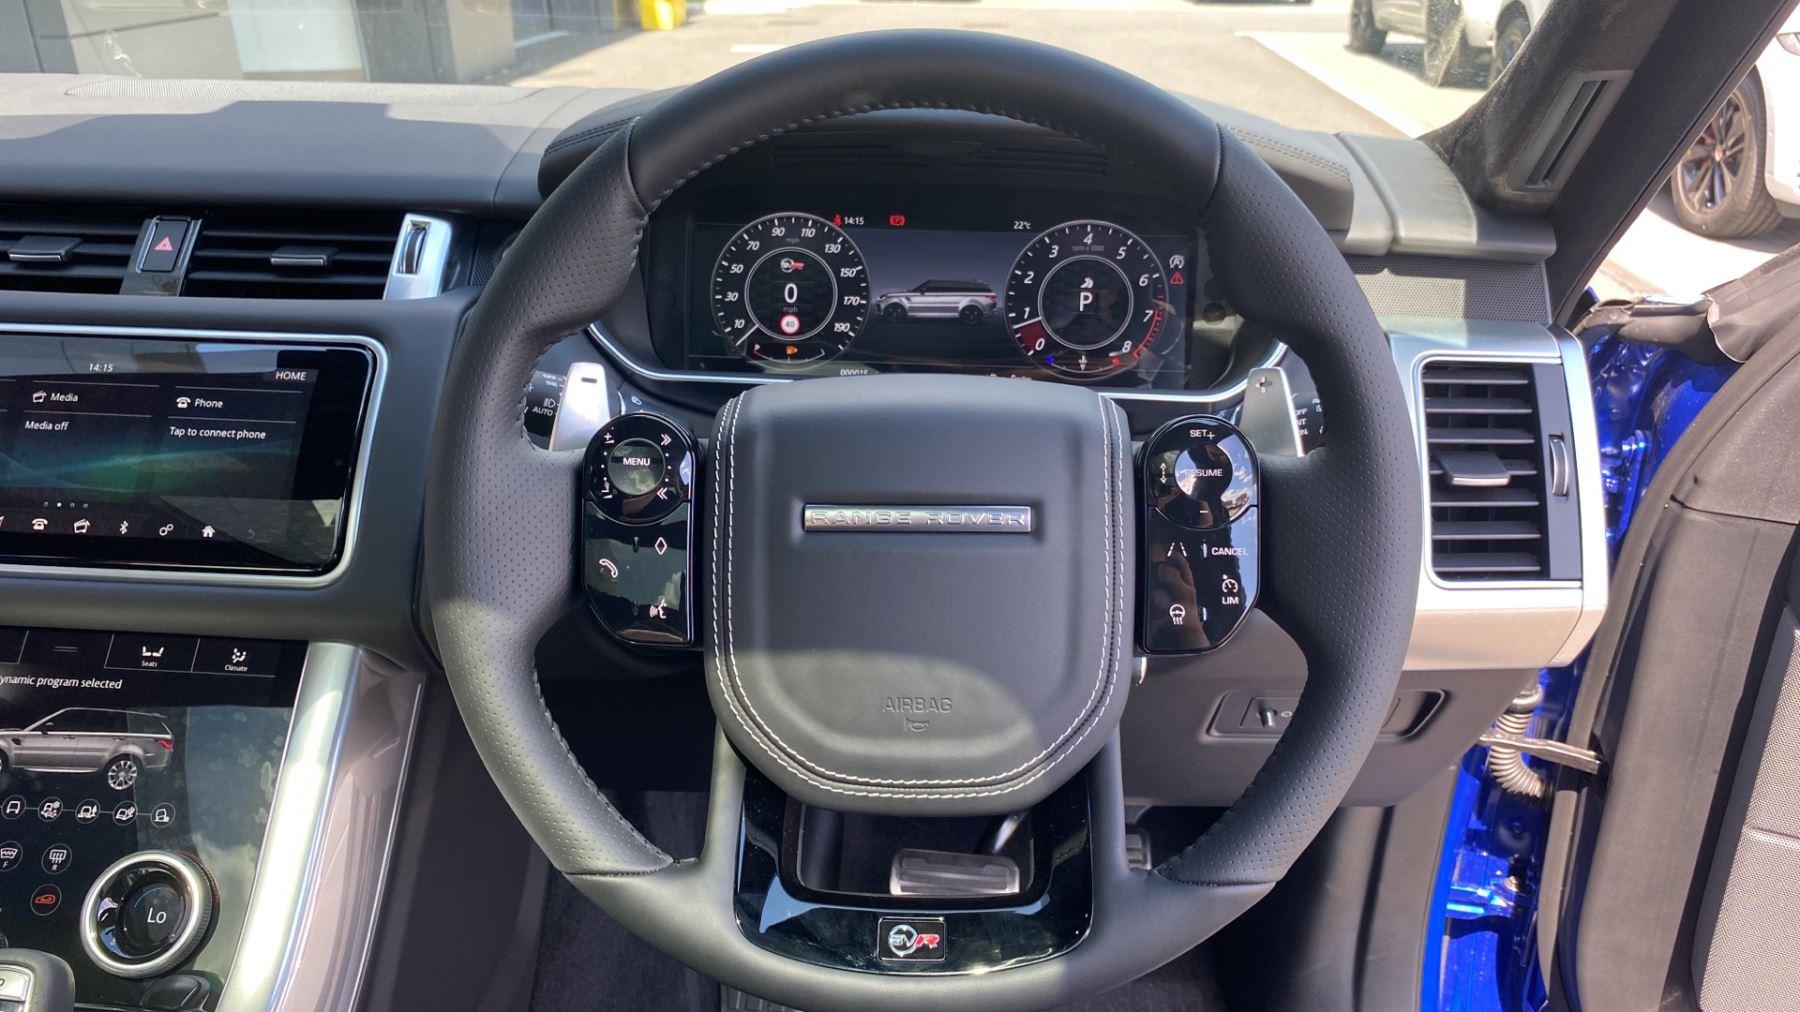 Land Rover Range Rover Sport 5.0 P575 S/C SVR image 10